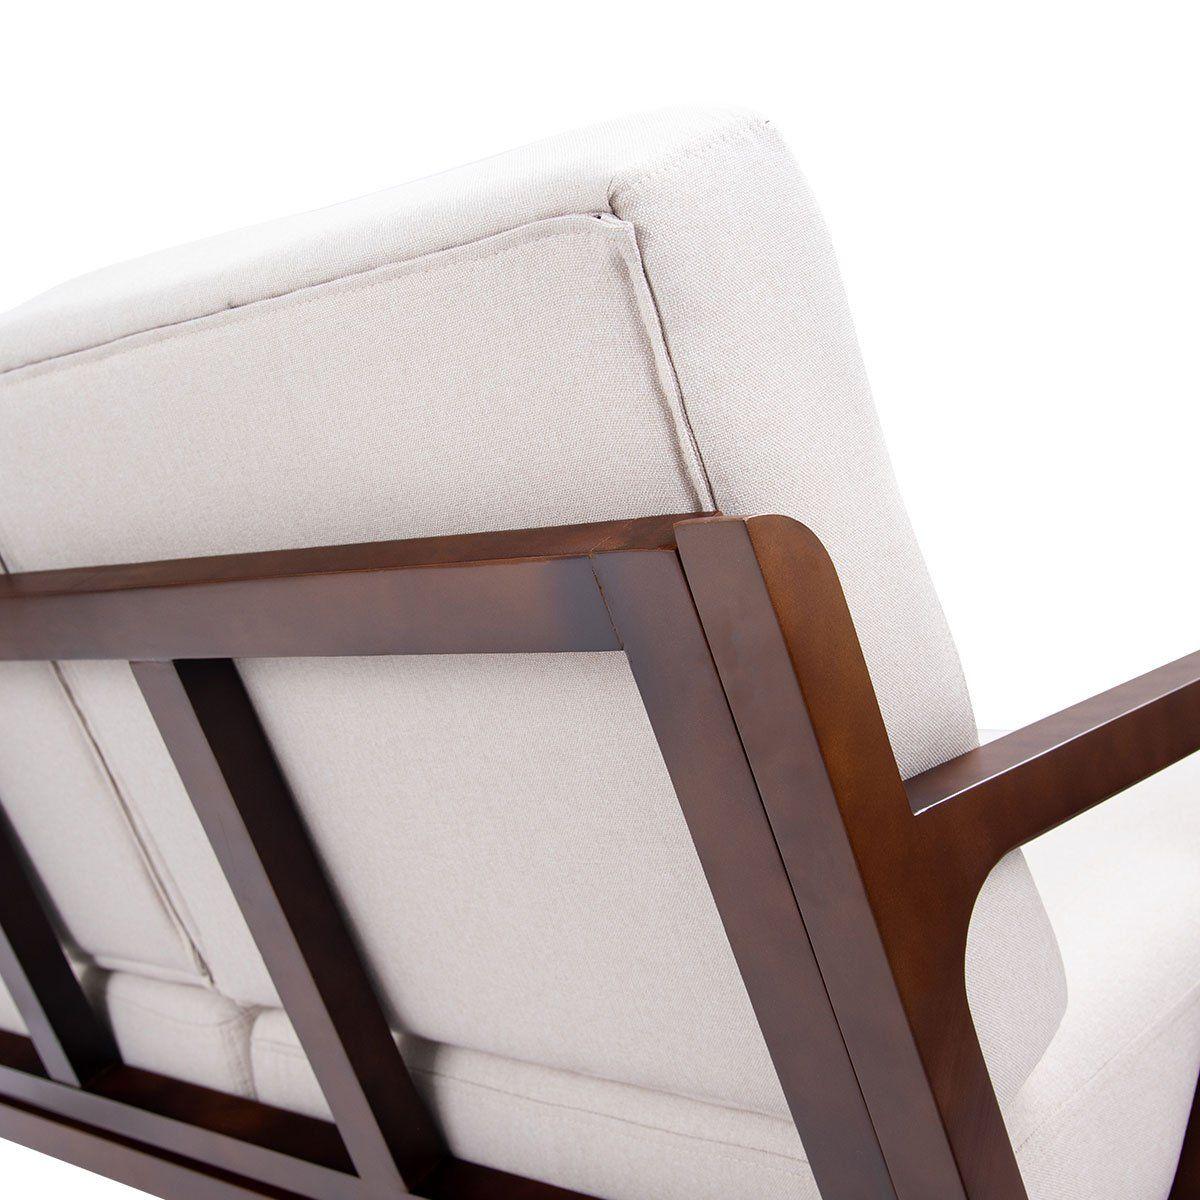 Giantex Loveseat Armchair Sofa Bench Fabric Upholstered ...